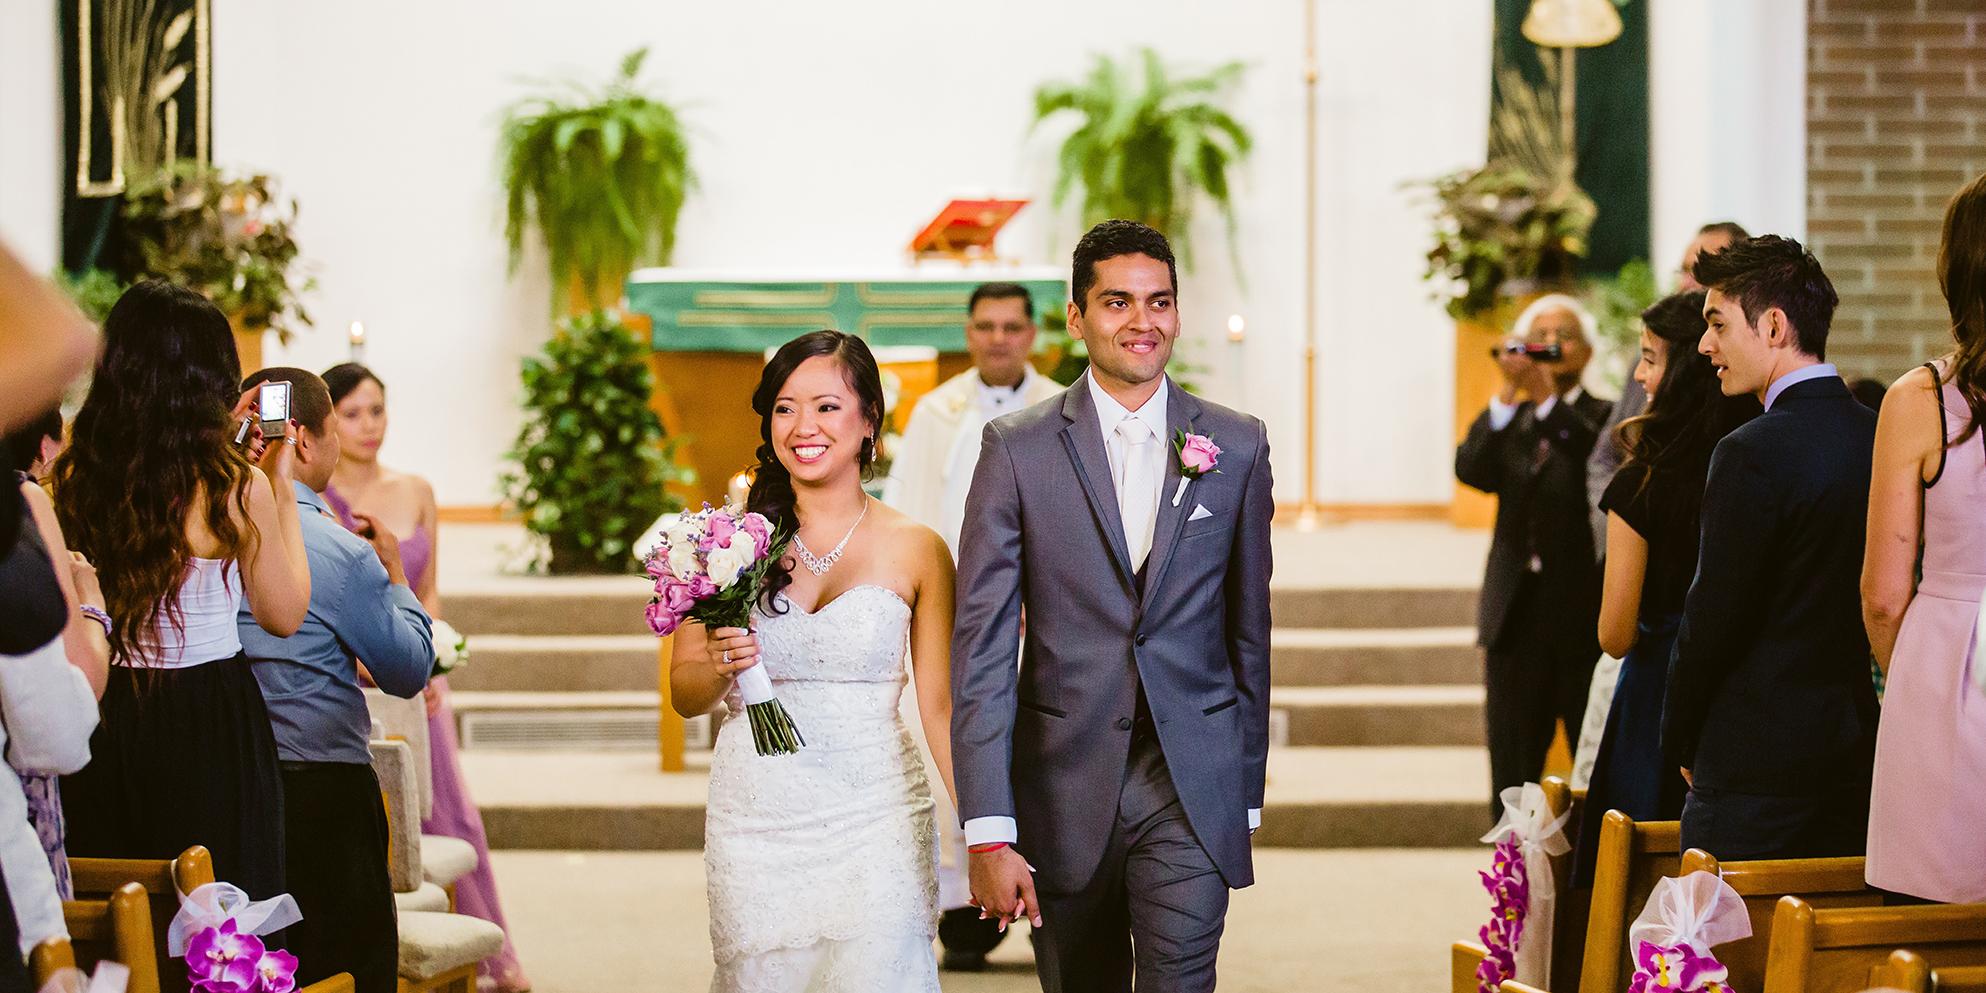 SP_JJ_calgary_wedding_photographer_011.jpg